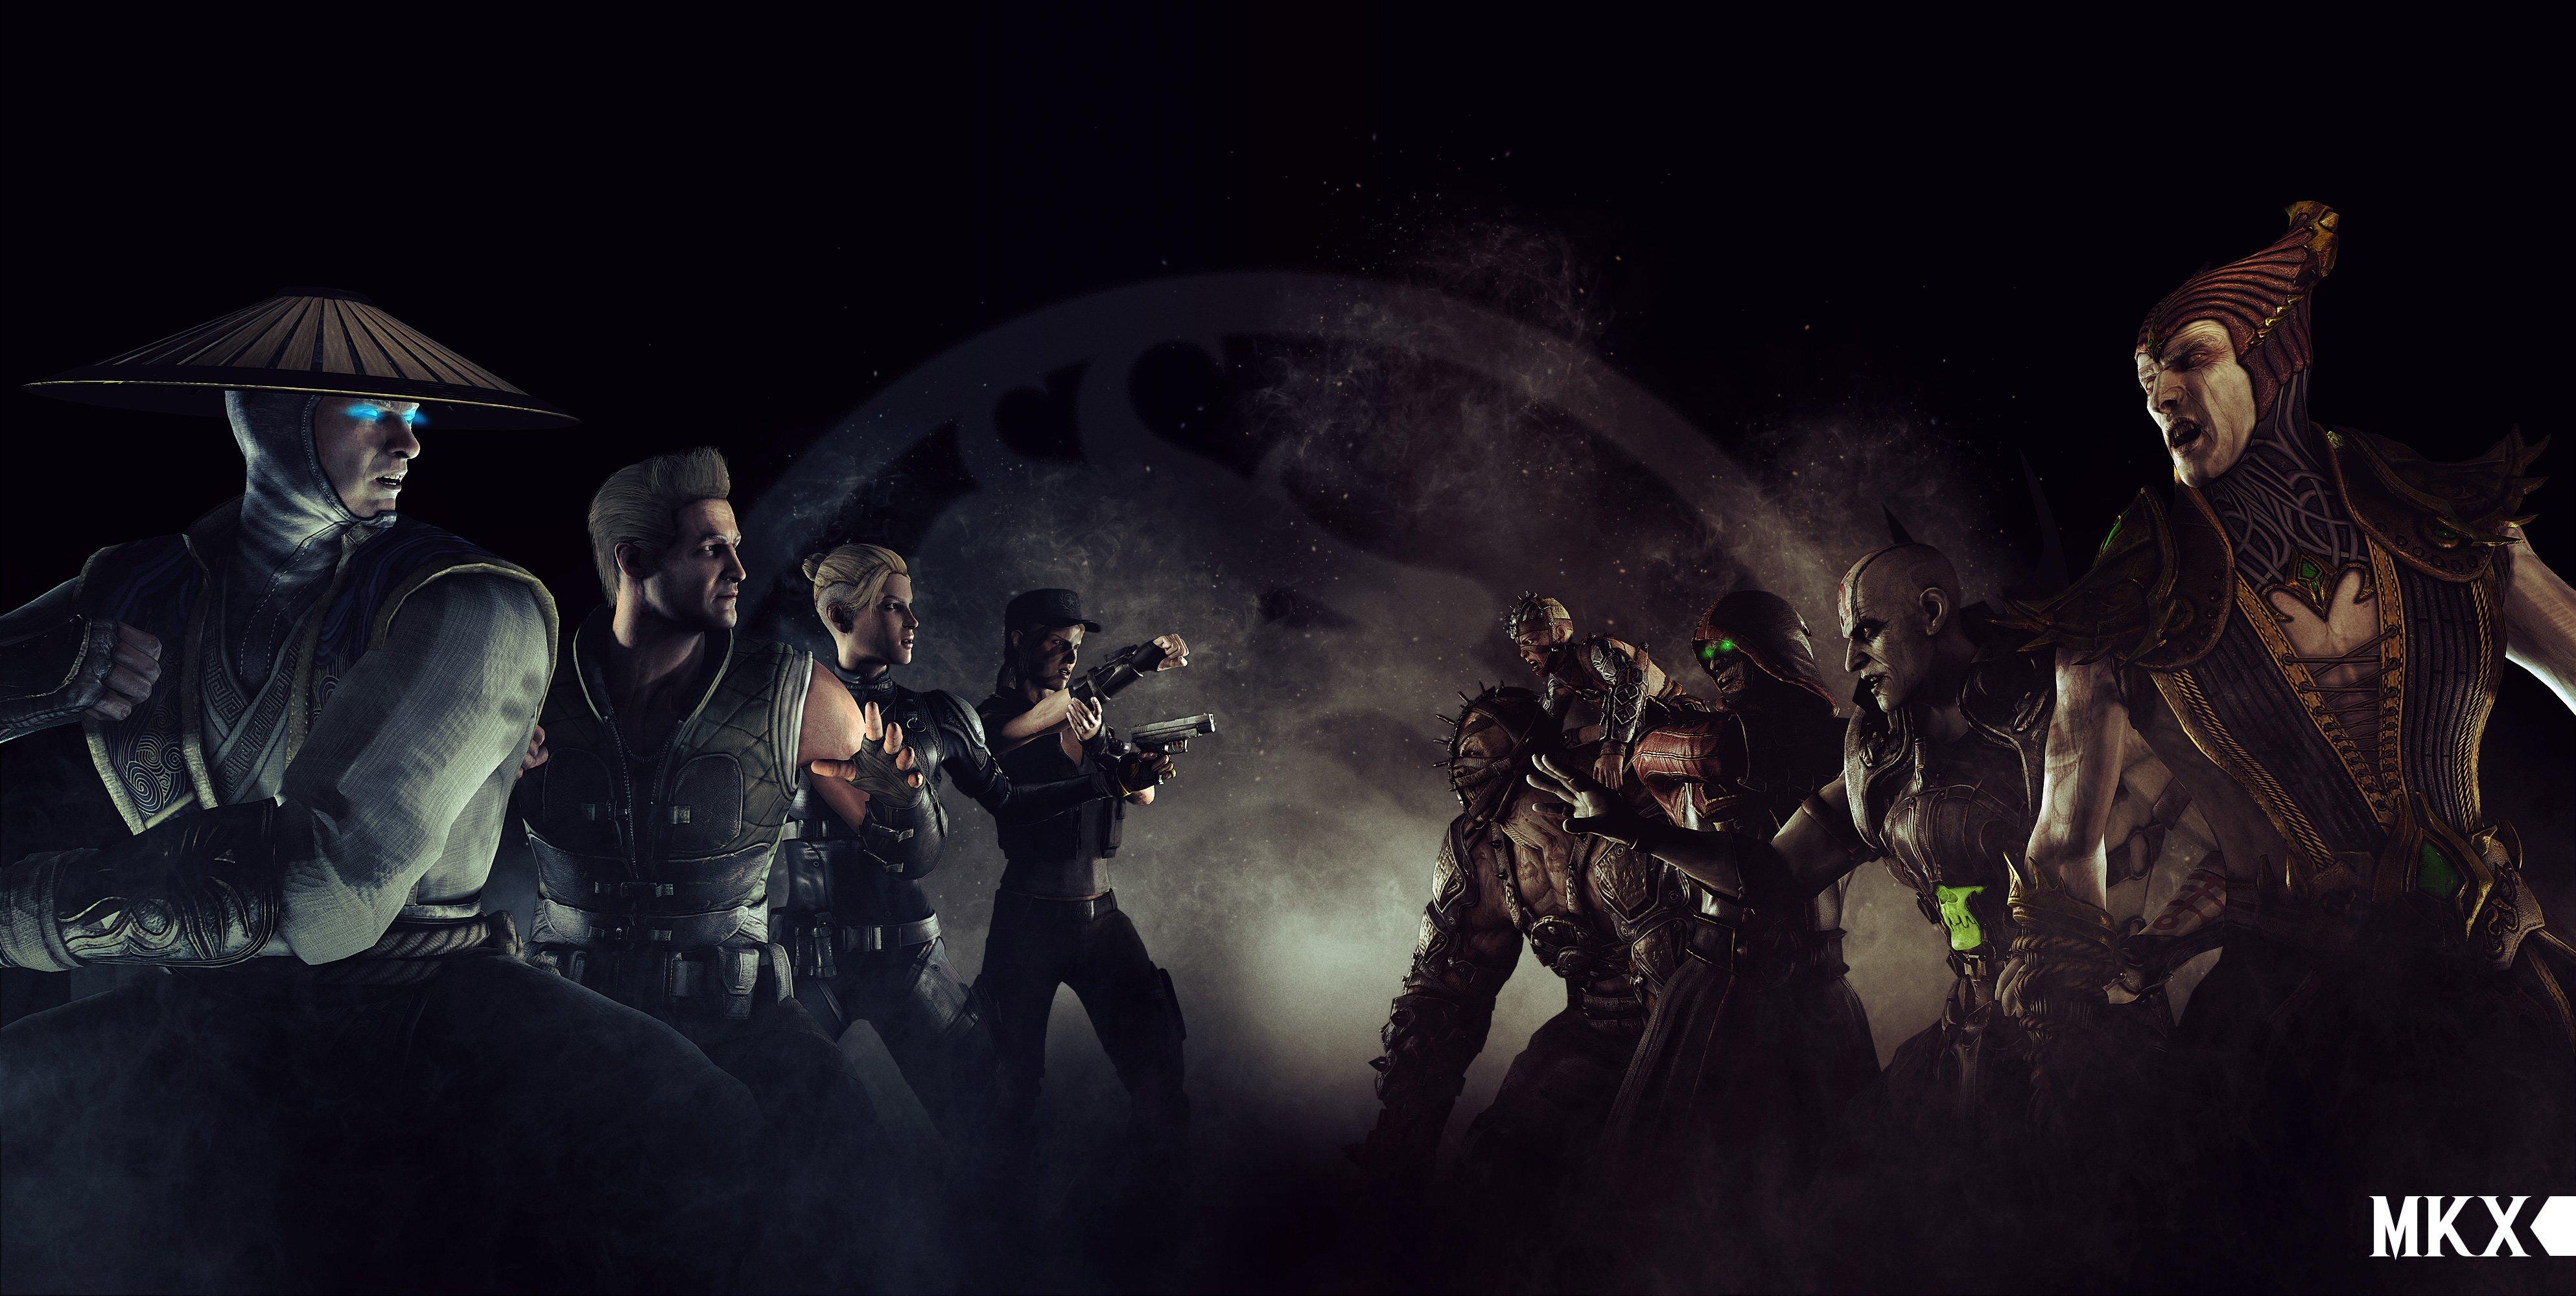 Mortal Kombat X Hd Wallpaper Background Image 3974x2000